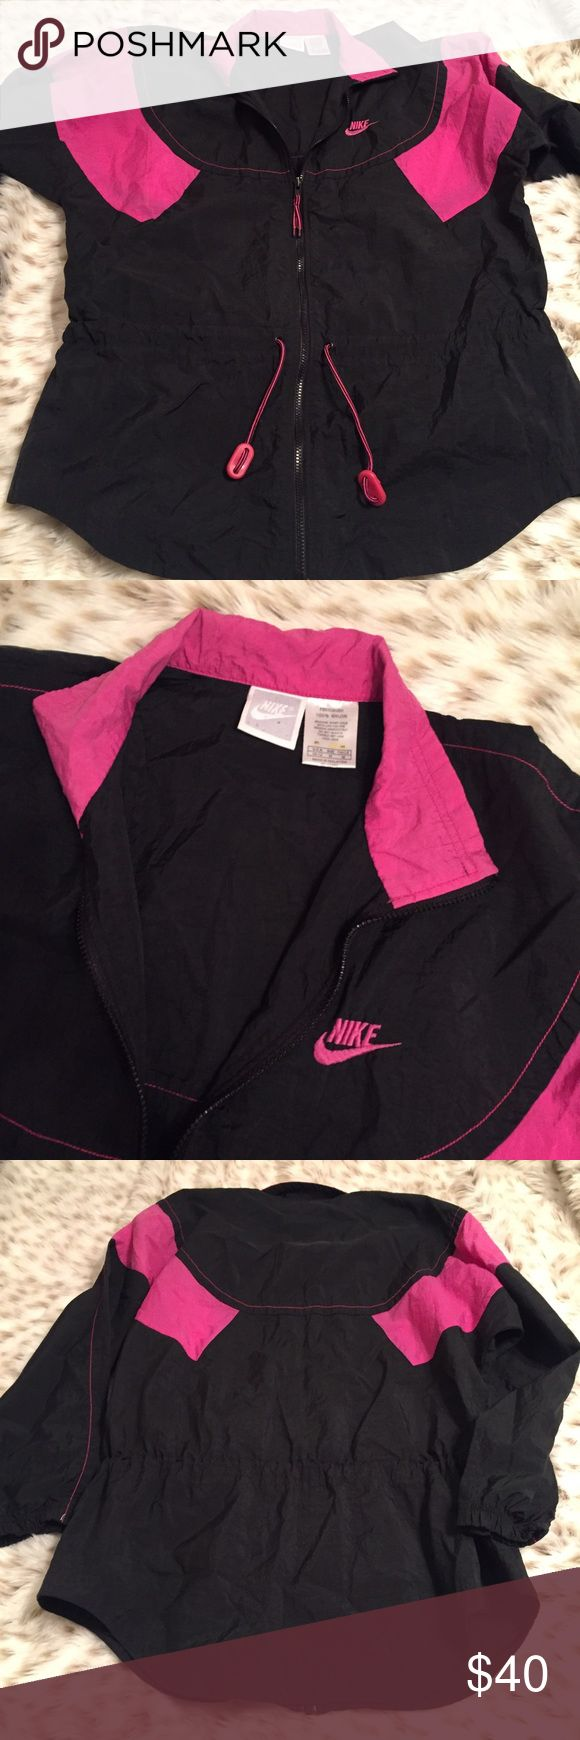 Vintage Nike Windbreaker Black Vintage Nike jacket! Windbreaker! So cuuuute it's black and pink! Has a drawstring waistband! No flaws! Size medium! Nike Jackets & Coats